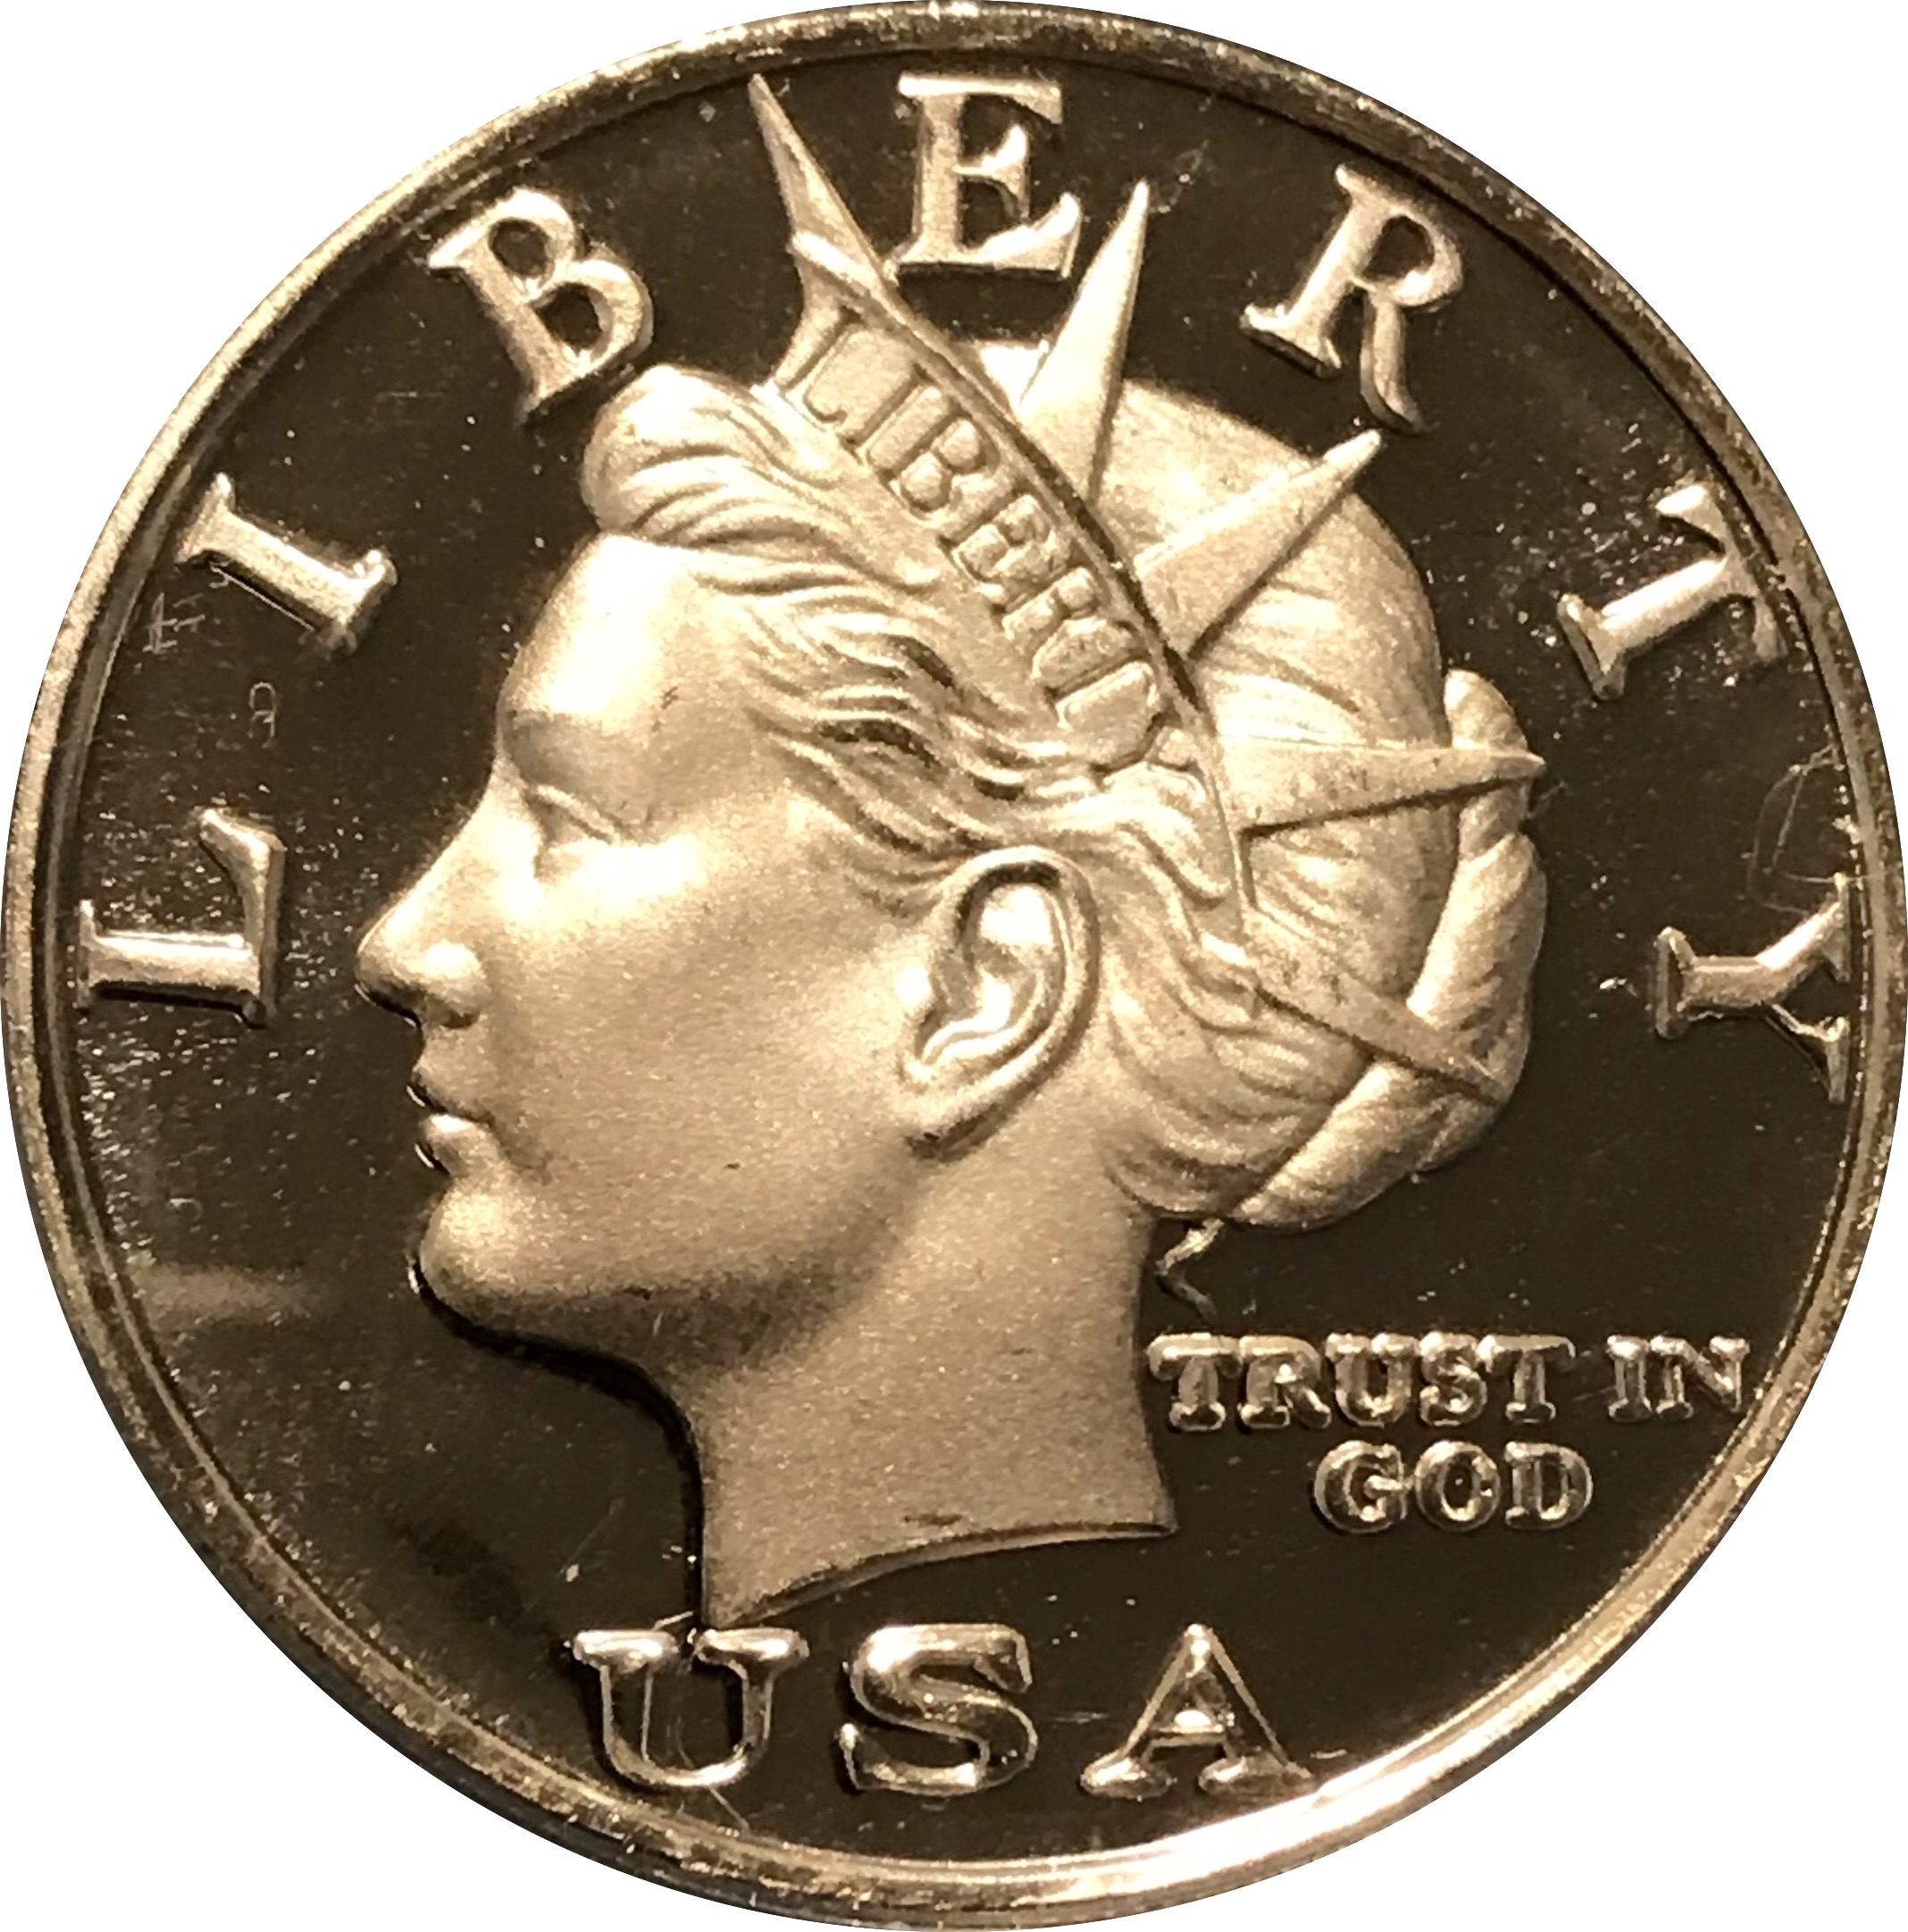 2003 Silver Norfed Liberty $10 Coin